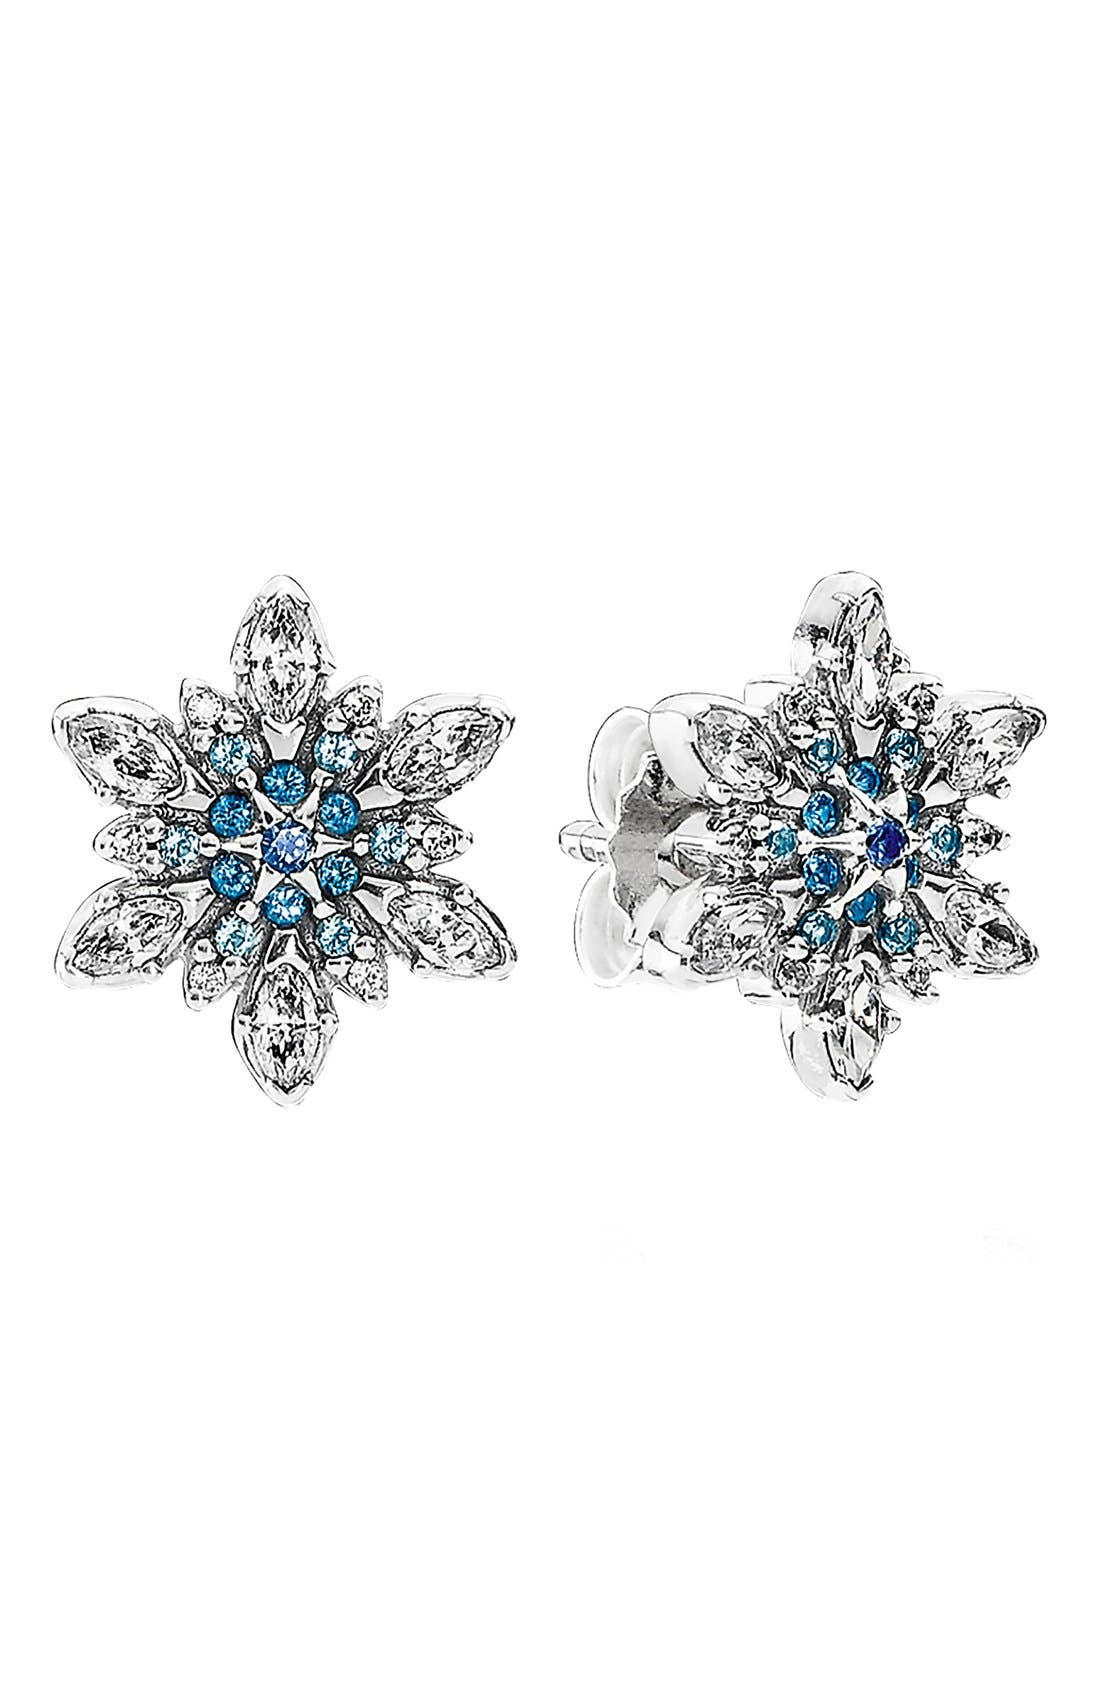 Main Image - PANDORA 'Snowflake' Crystal Stud Earrings